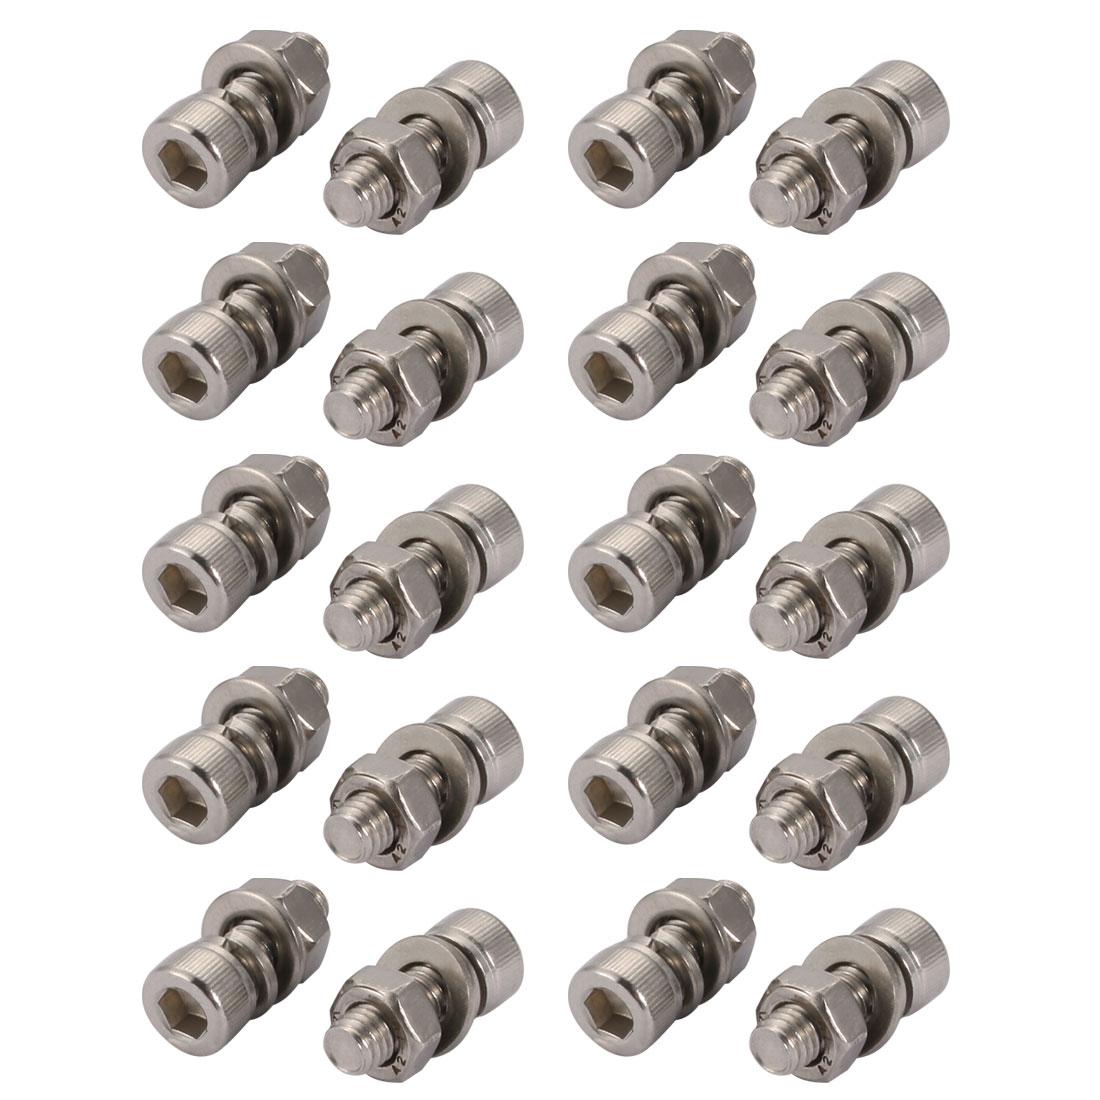 20Pcs M6x35mm 304 Stainless Steel Knurled Hex Socket Head Bolt Nut Set w Washer